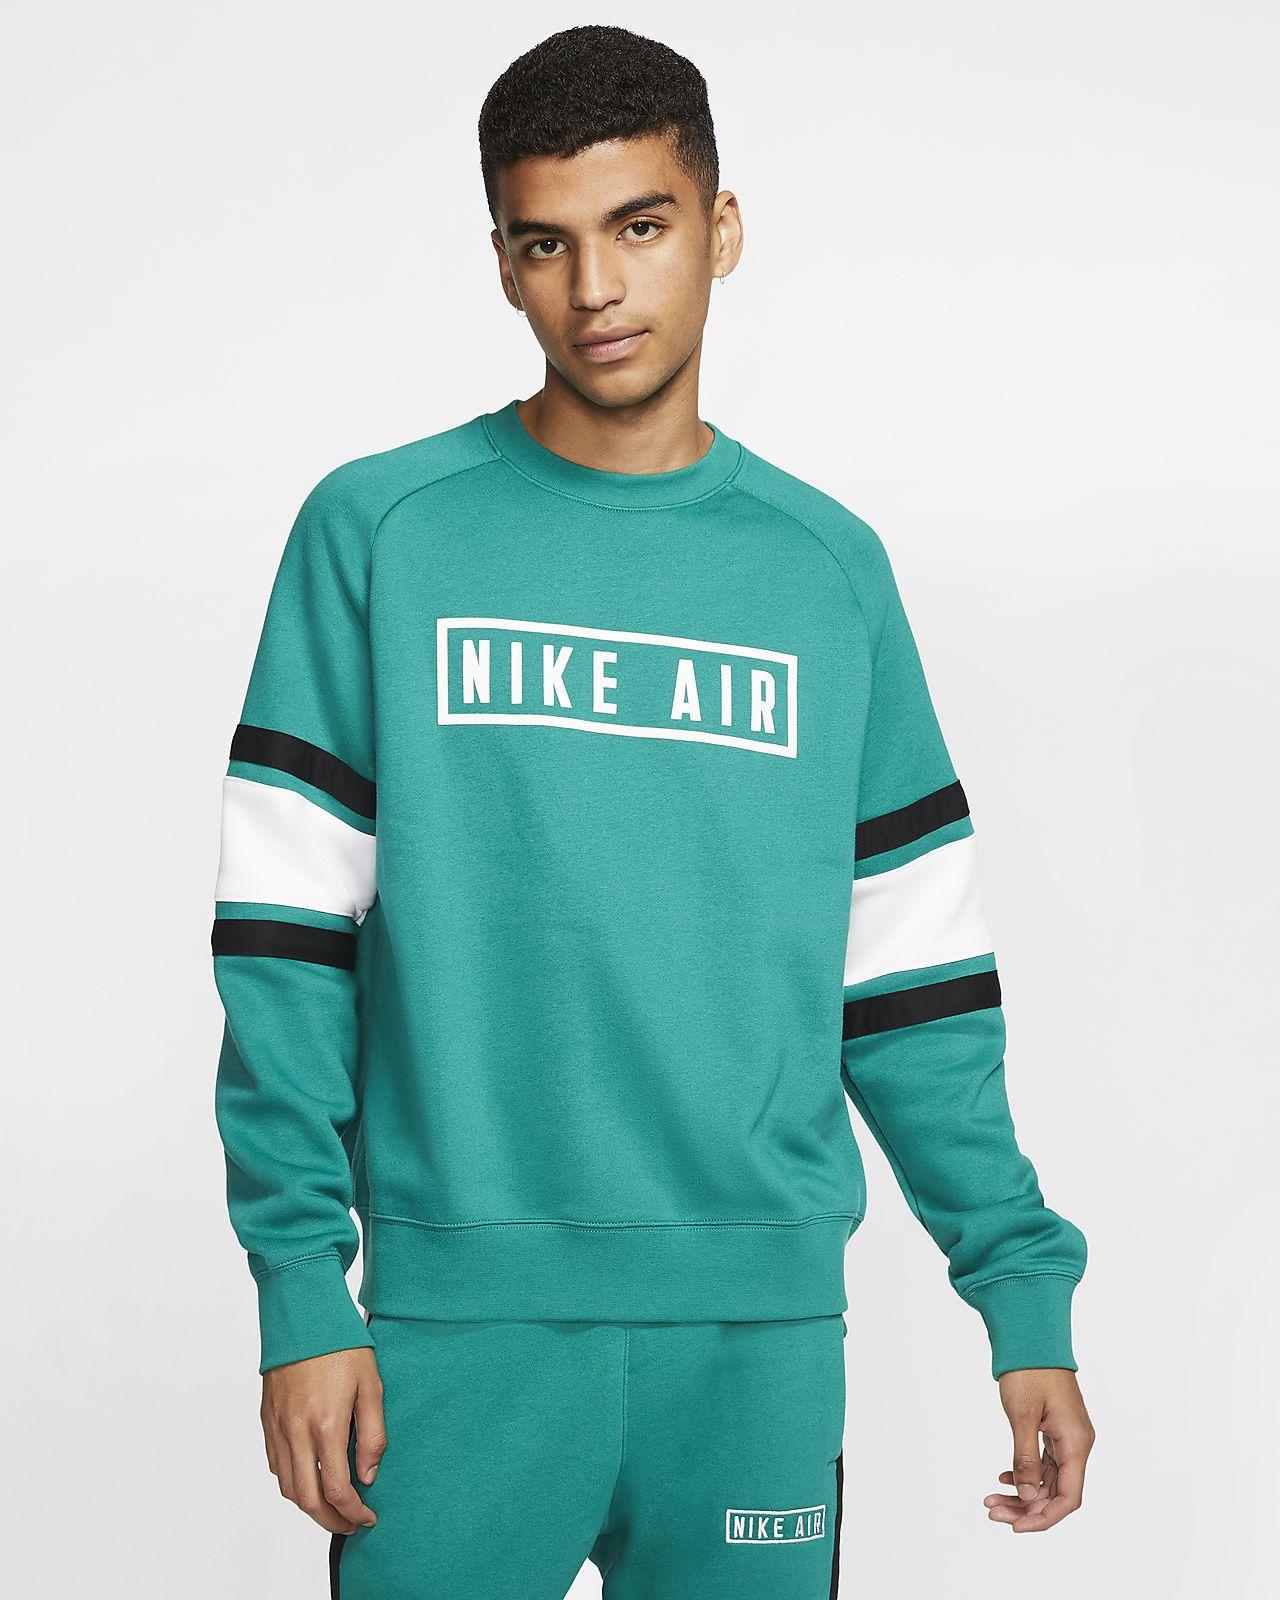 Nike Air-crewtrøje i fleece